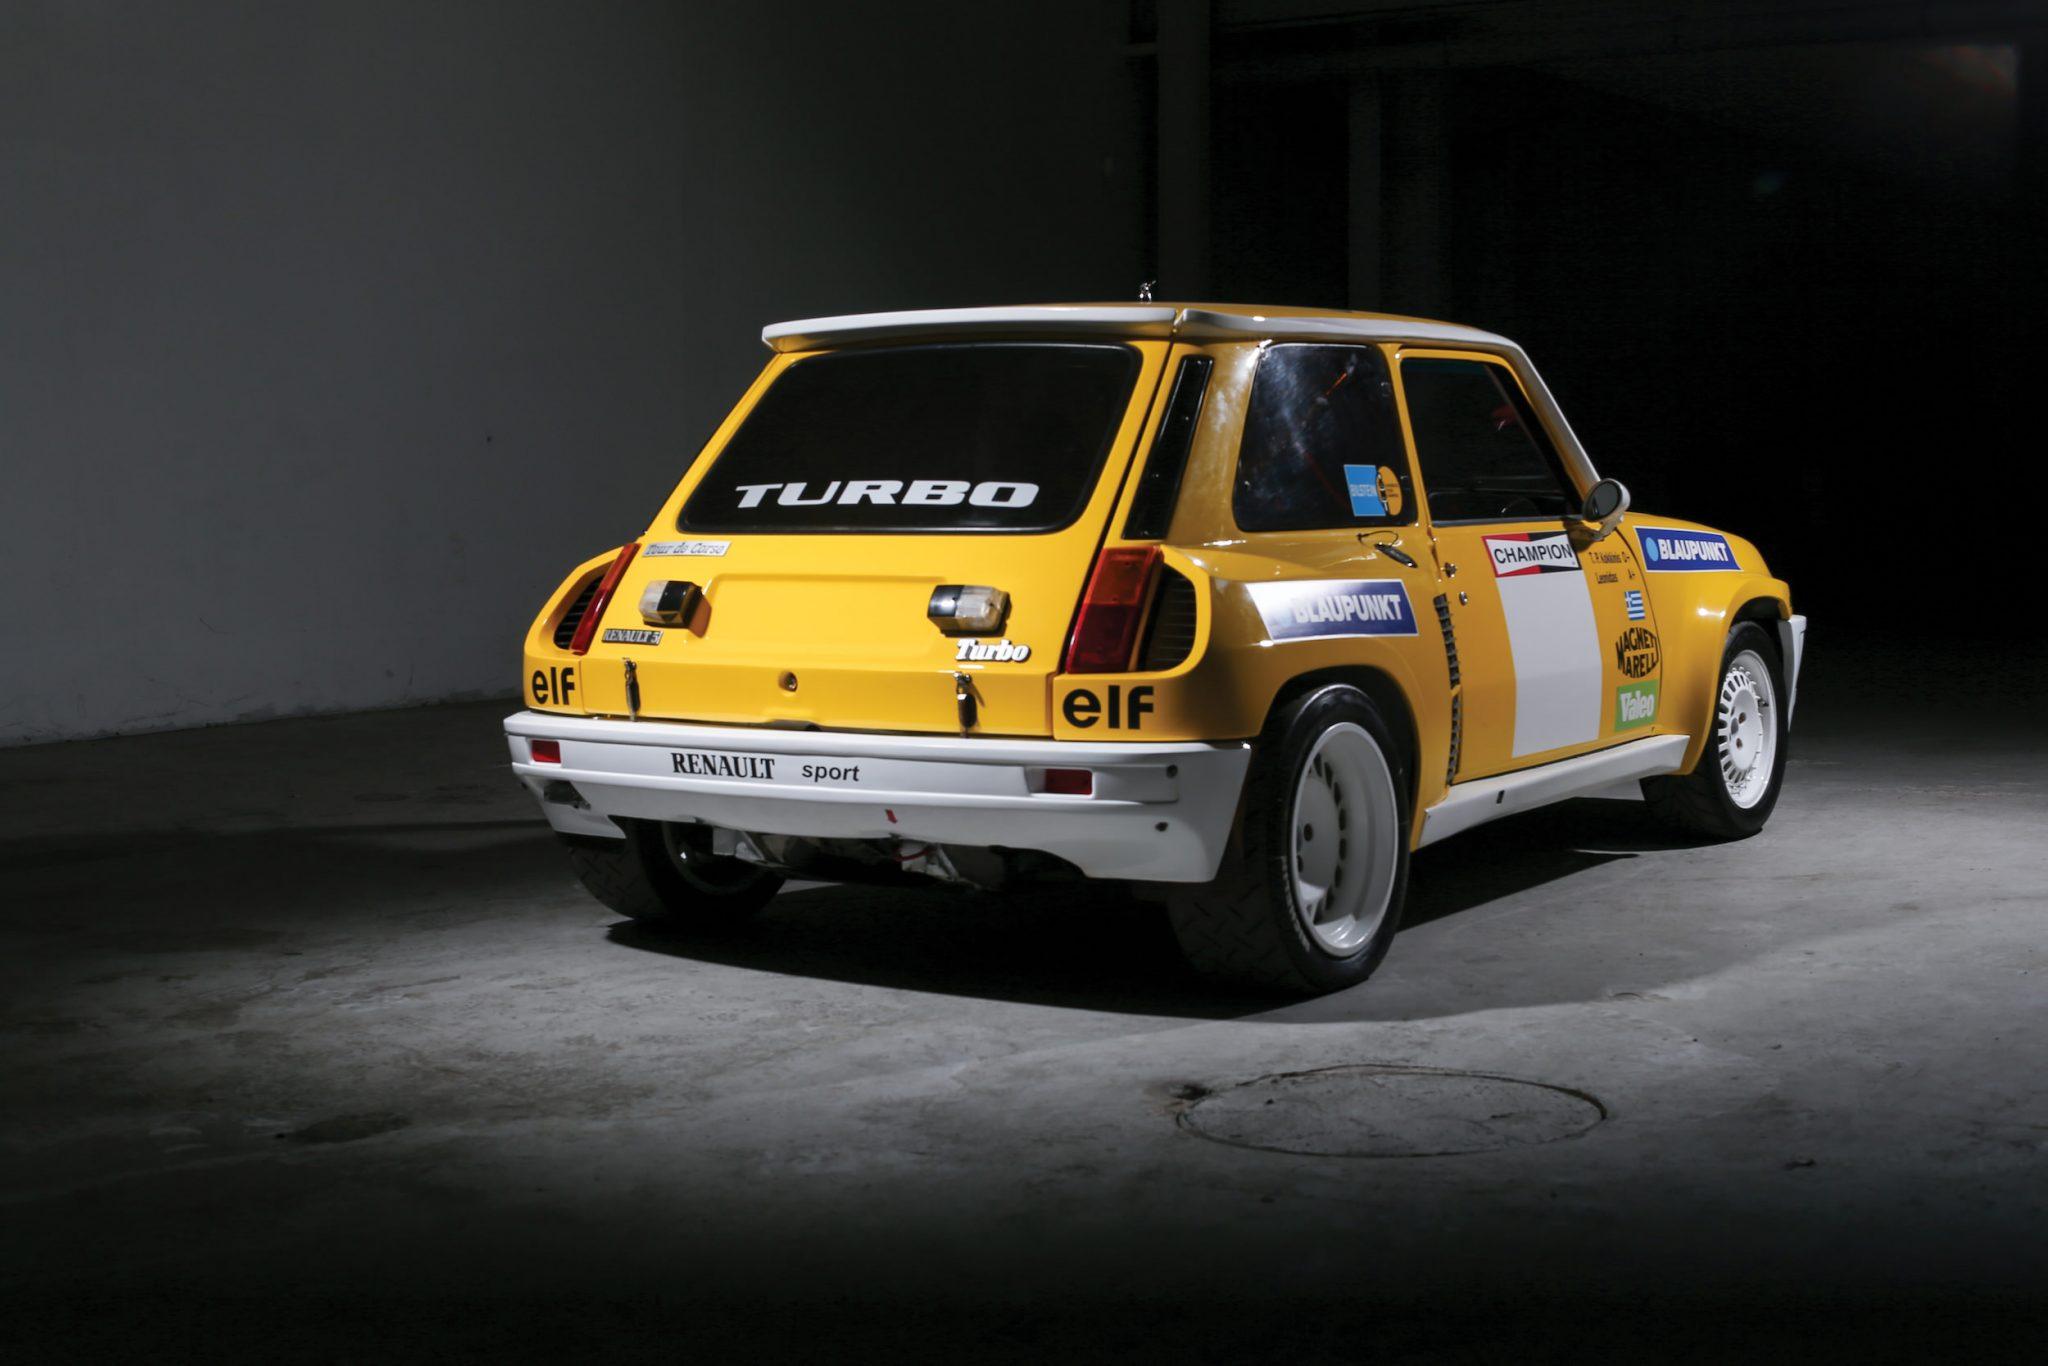 renault 5 turbo photo corse vintage